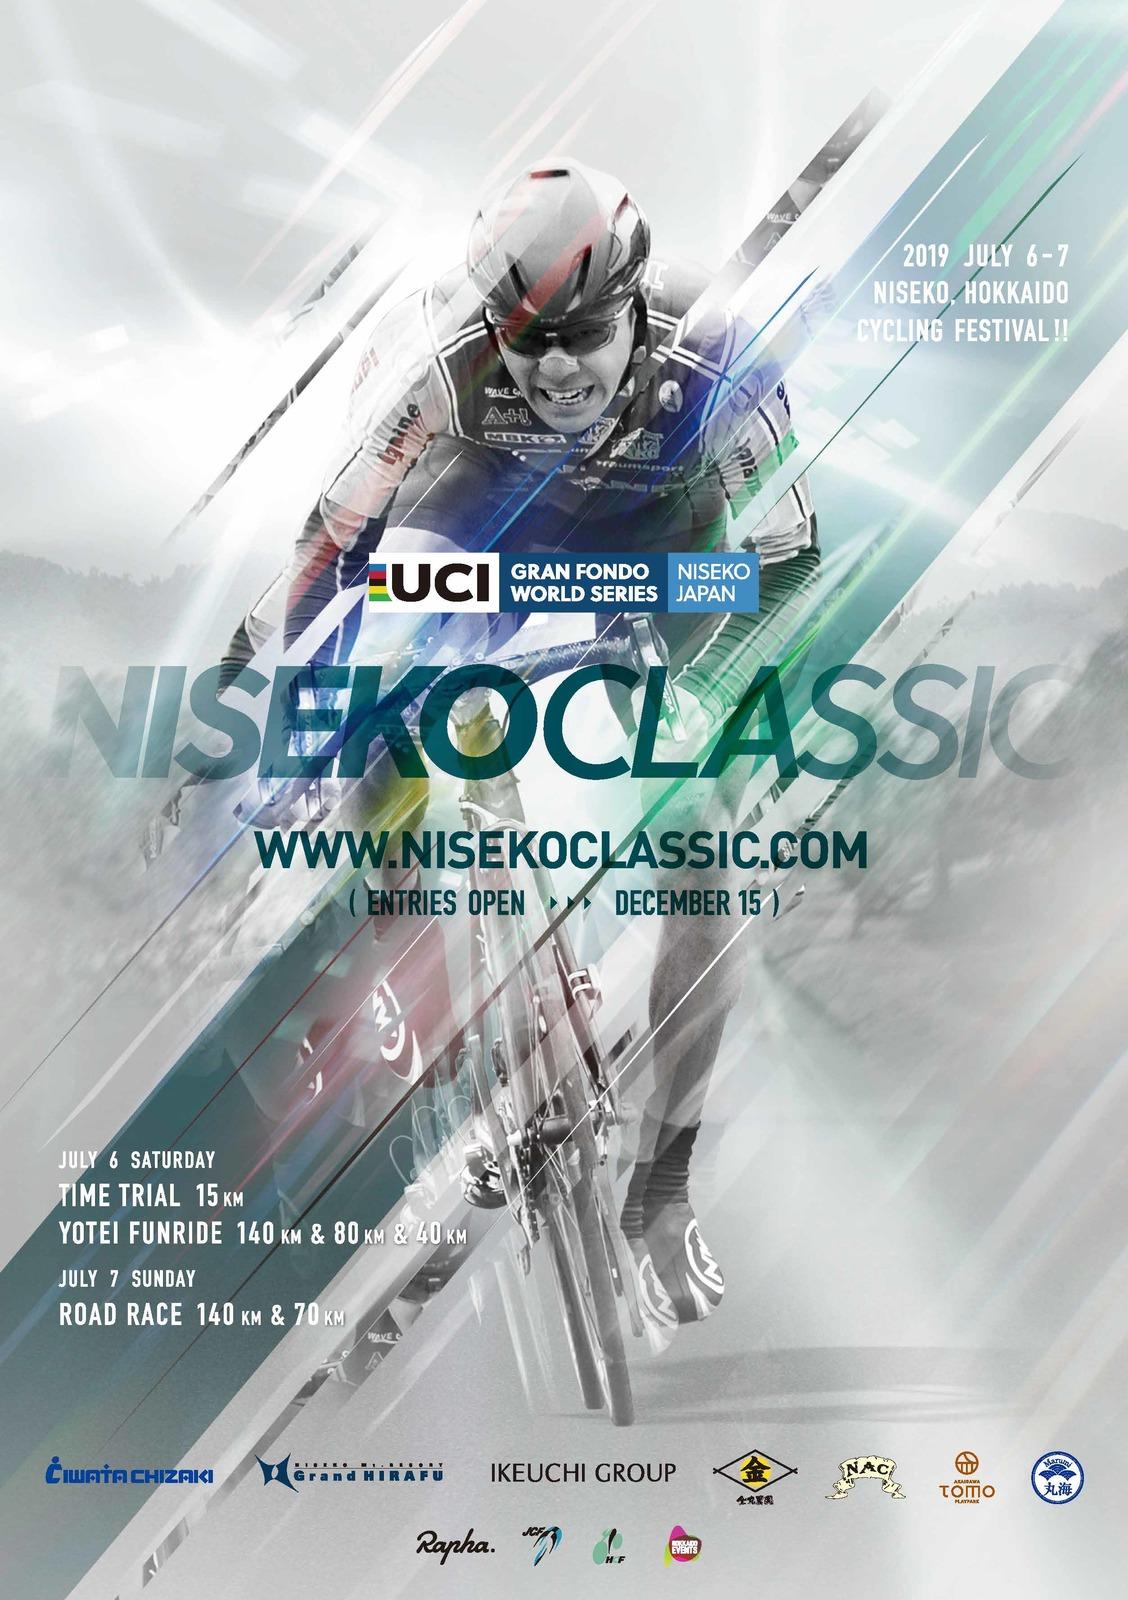 niseko classic 2019 cycling race